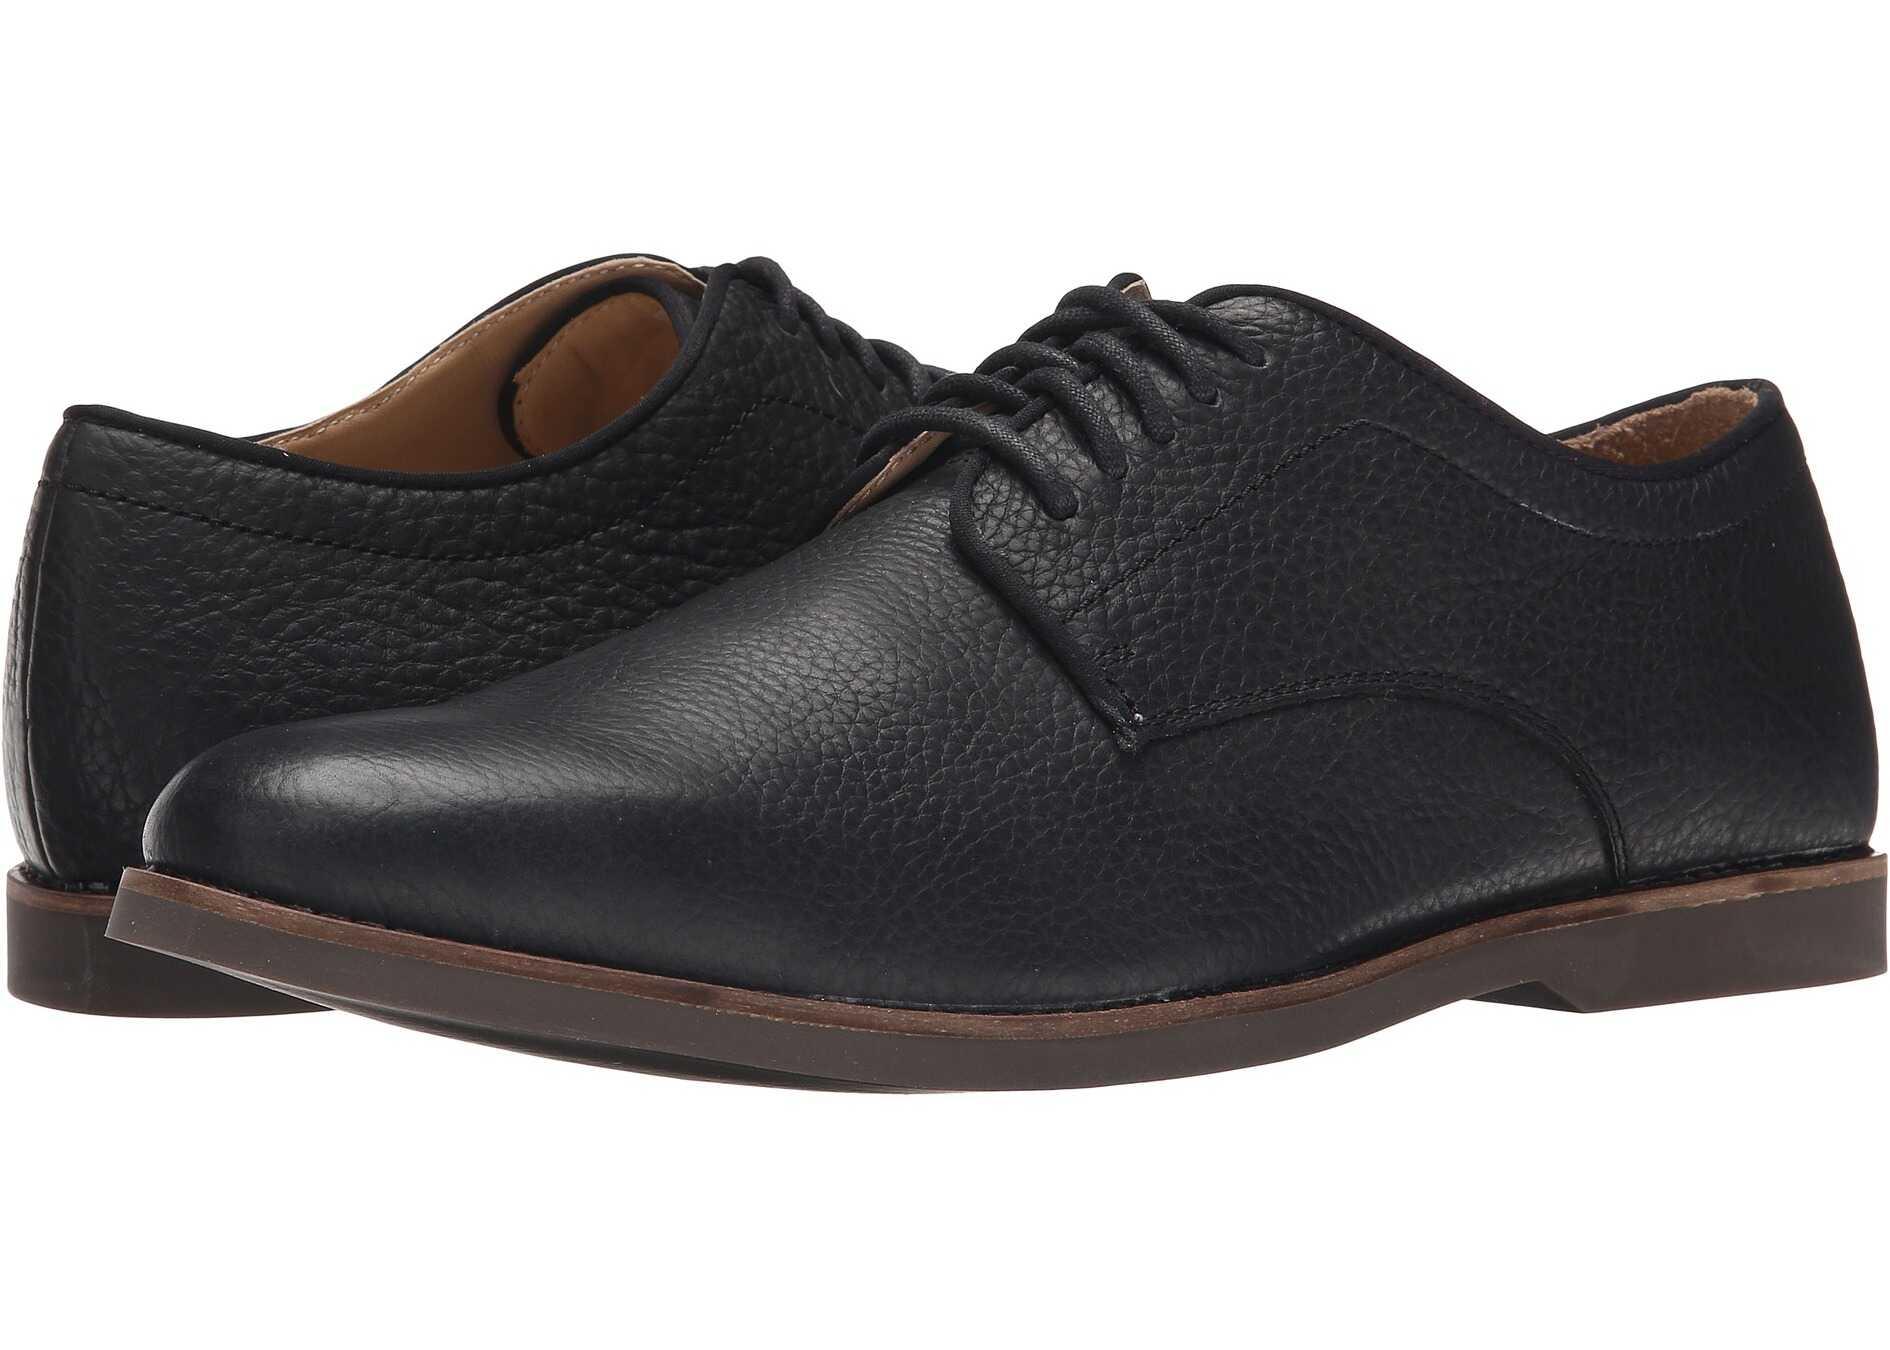 Sebago Norwich Oxford Black Bison Leather